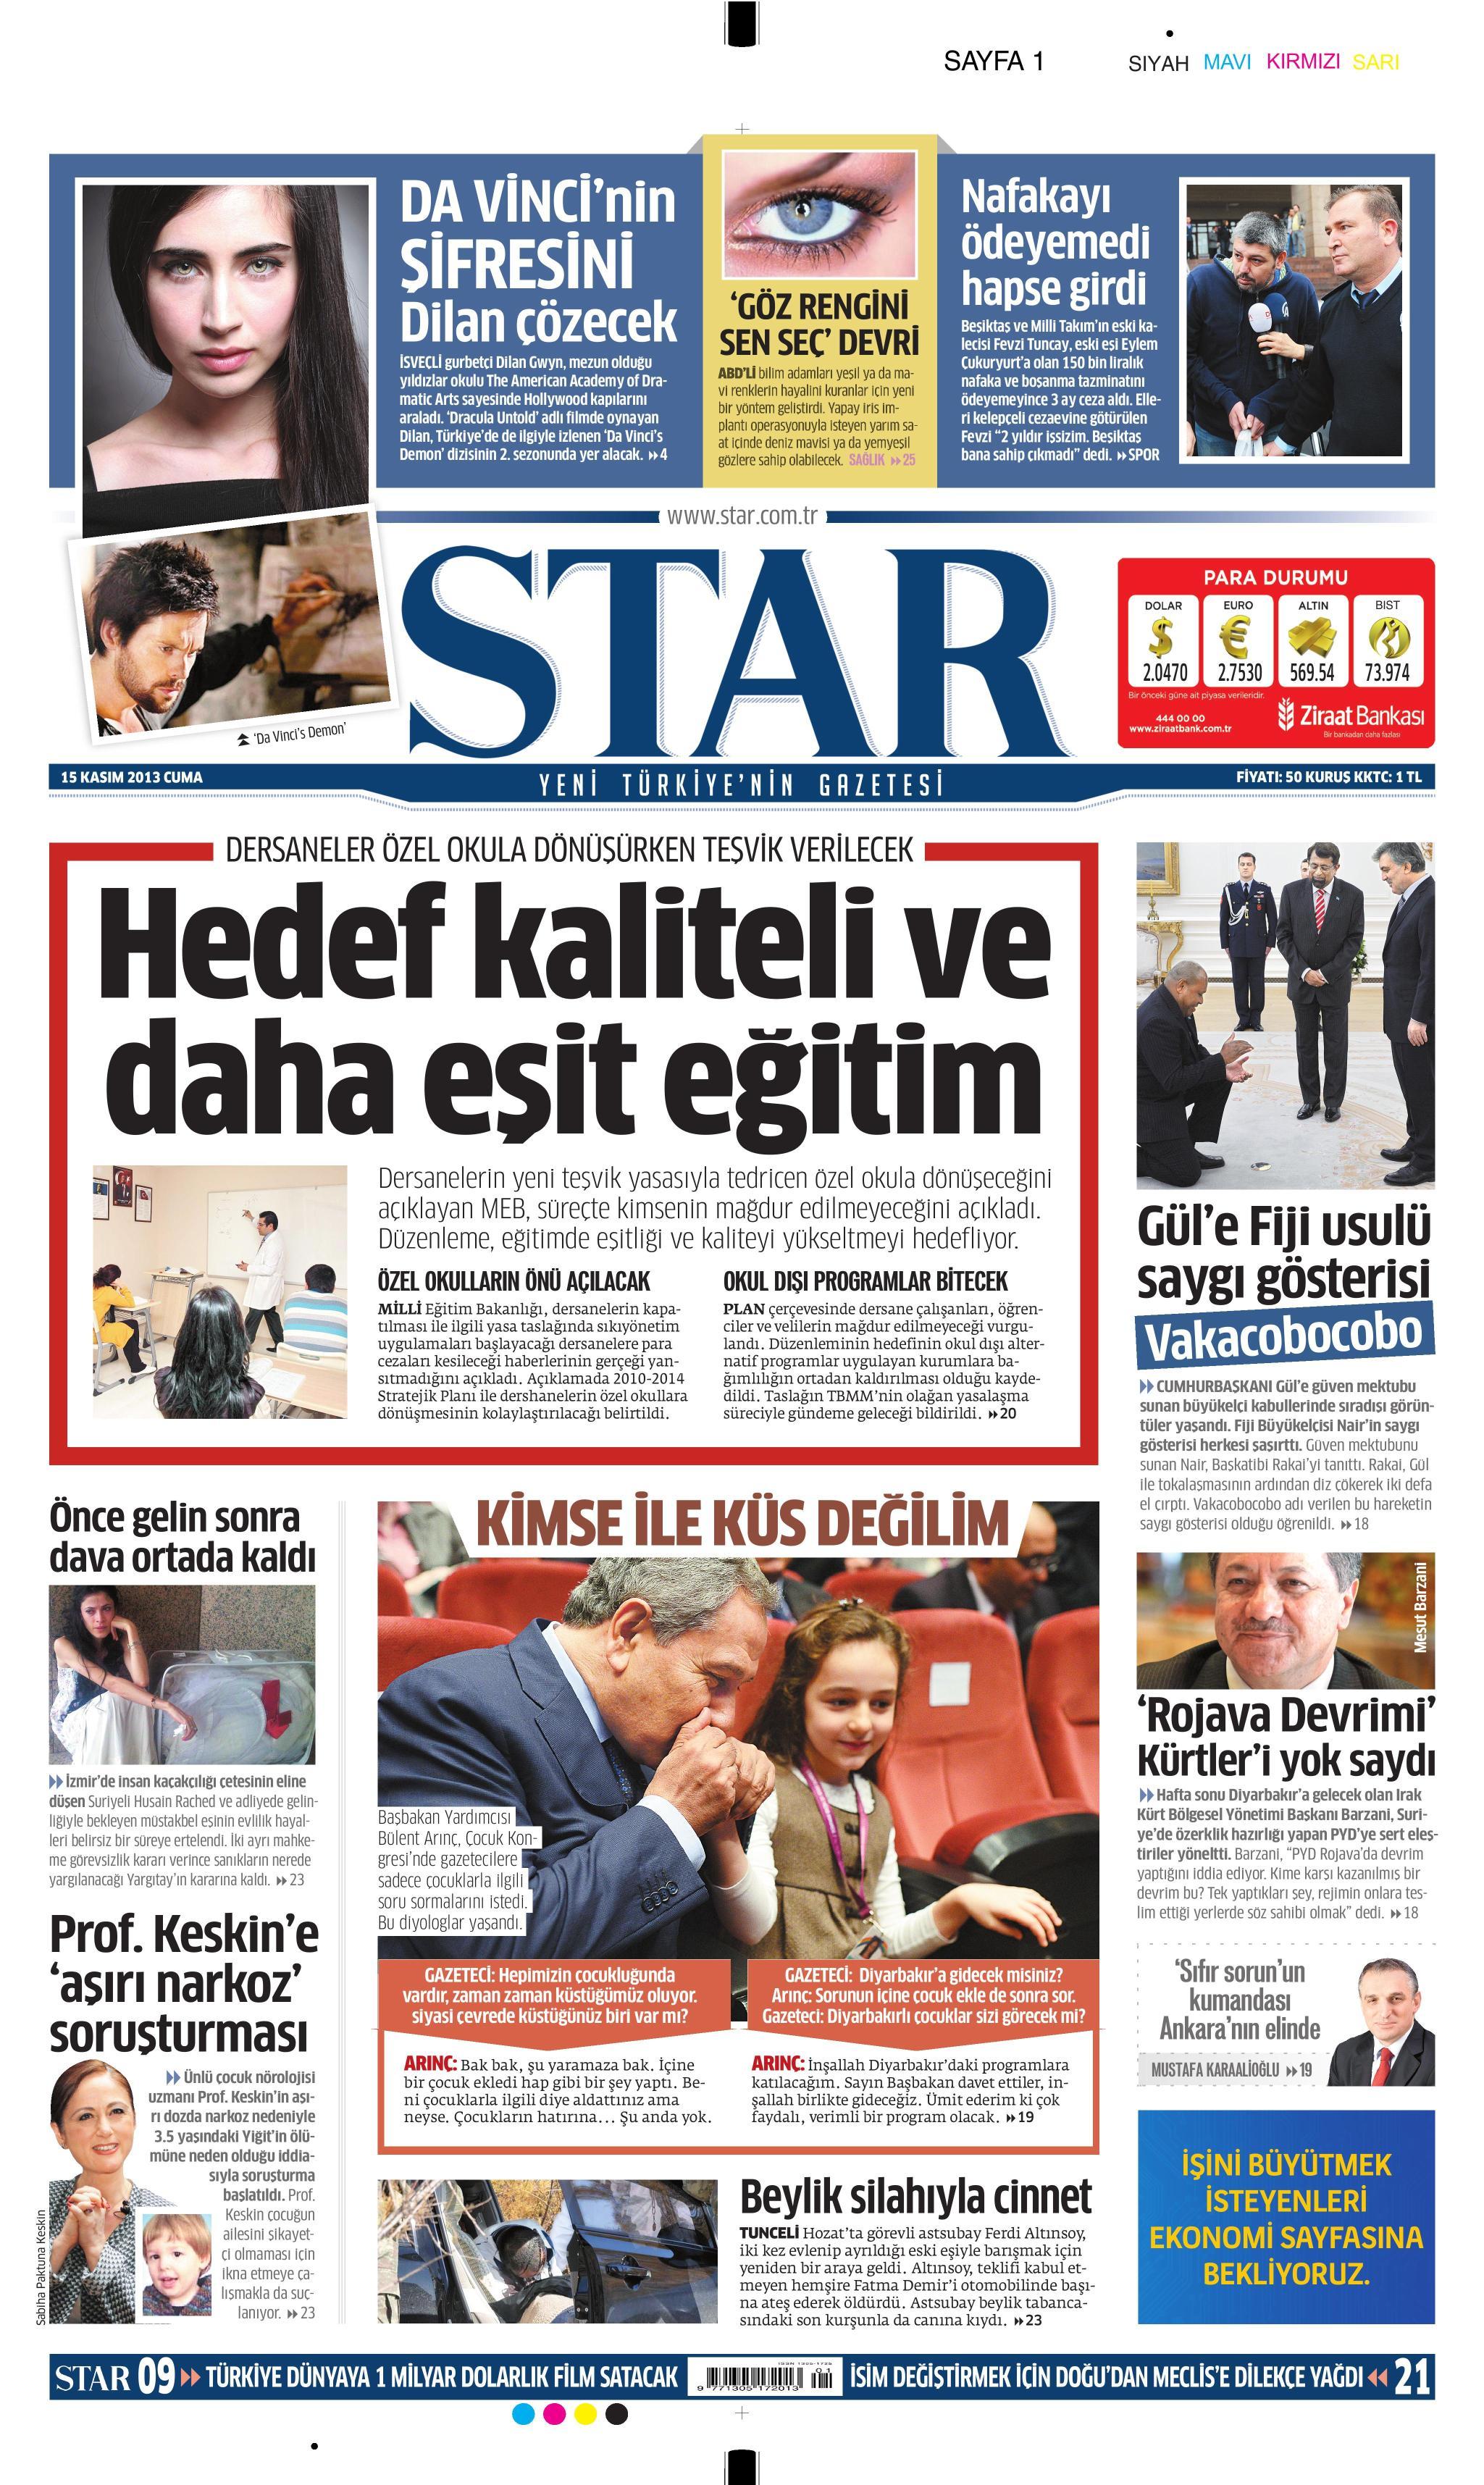 Dilan Gwyn - Star Gazetesi Haberi 3